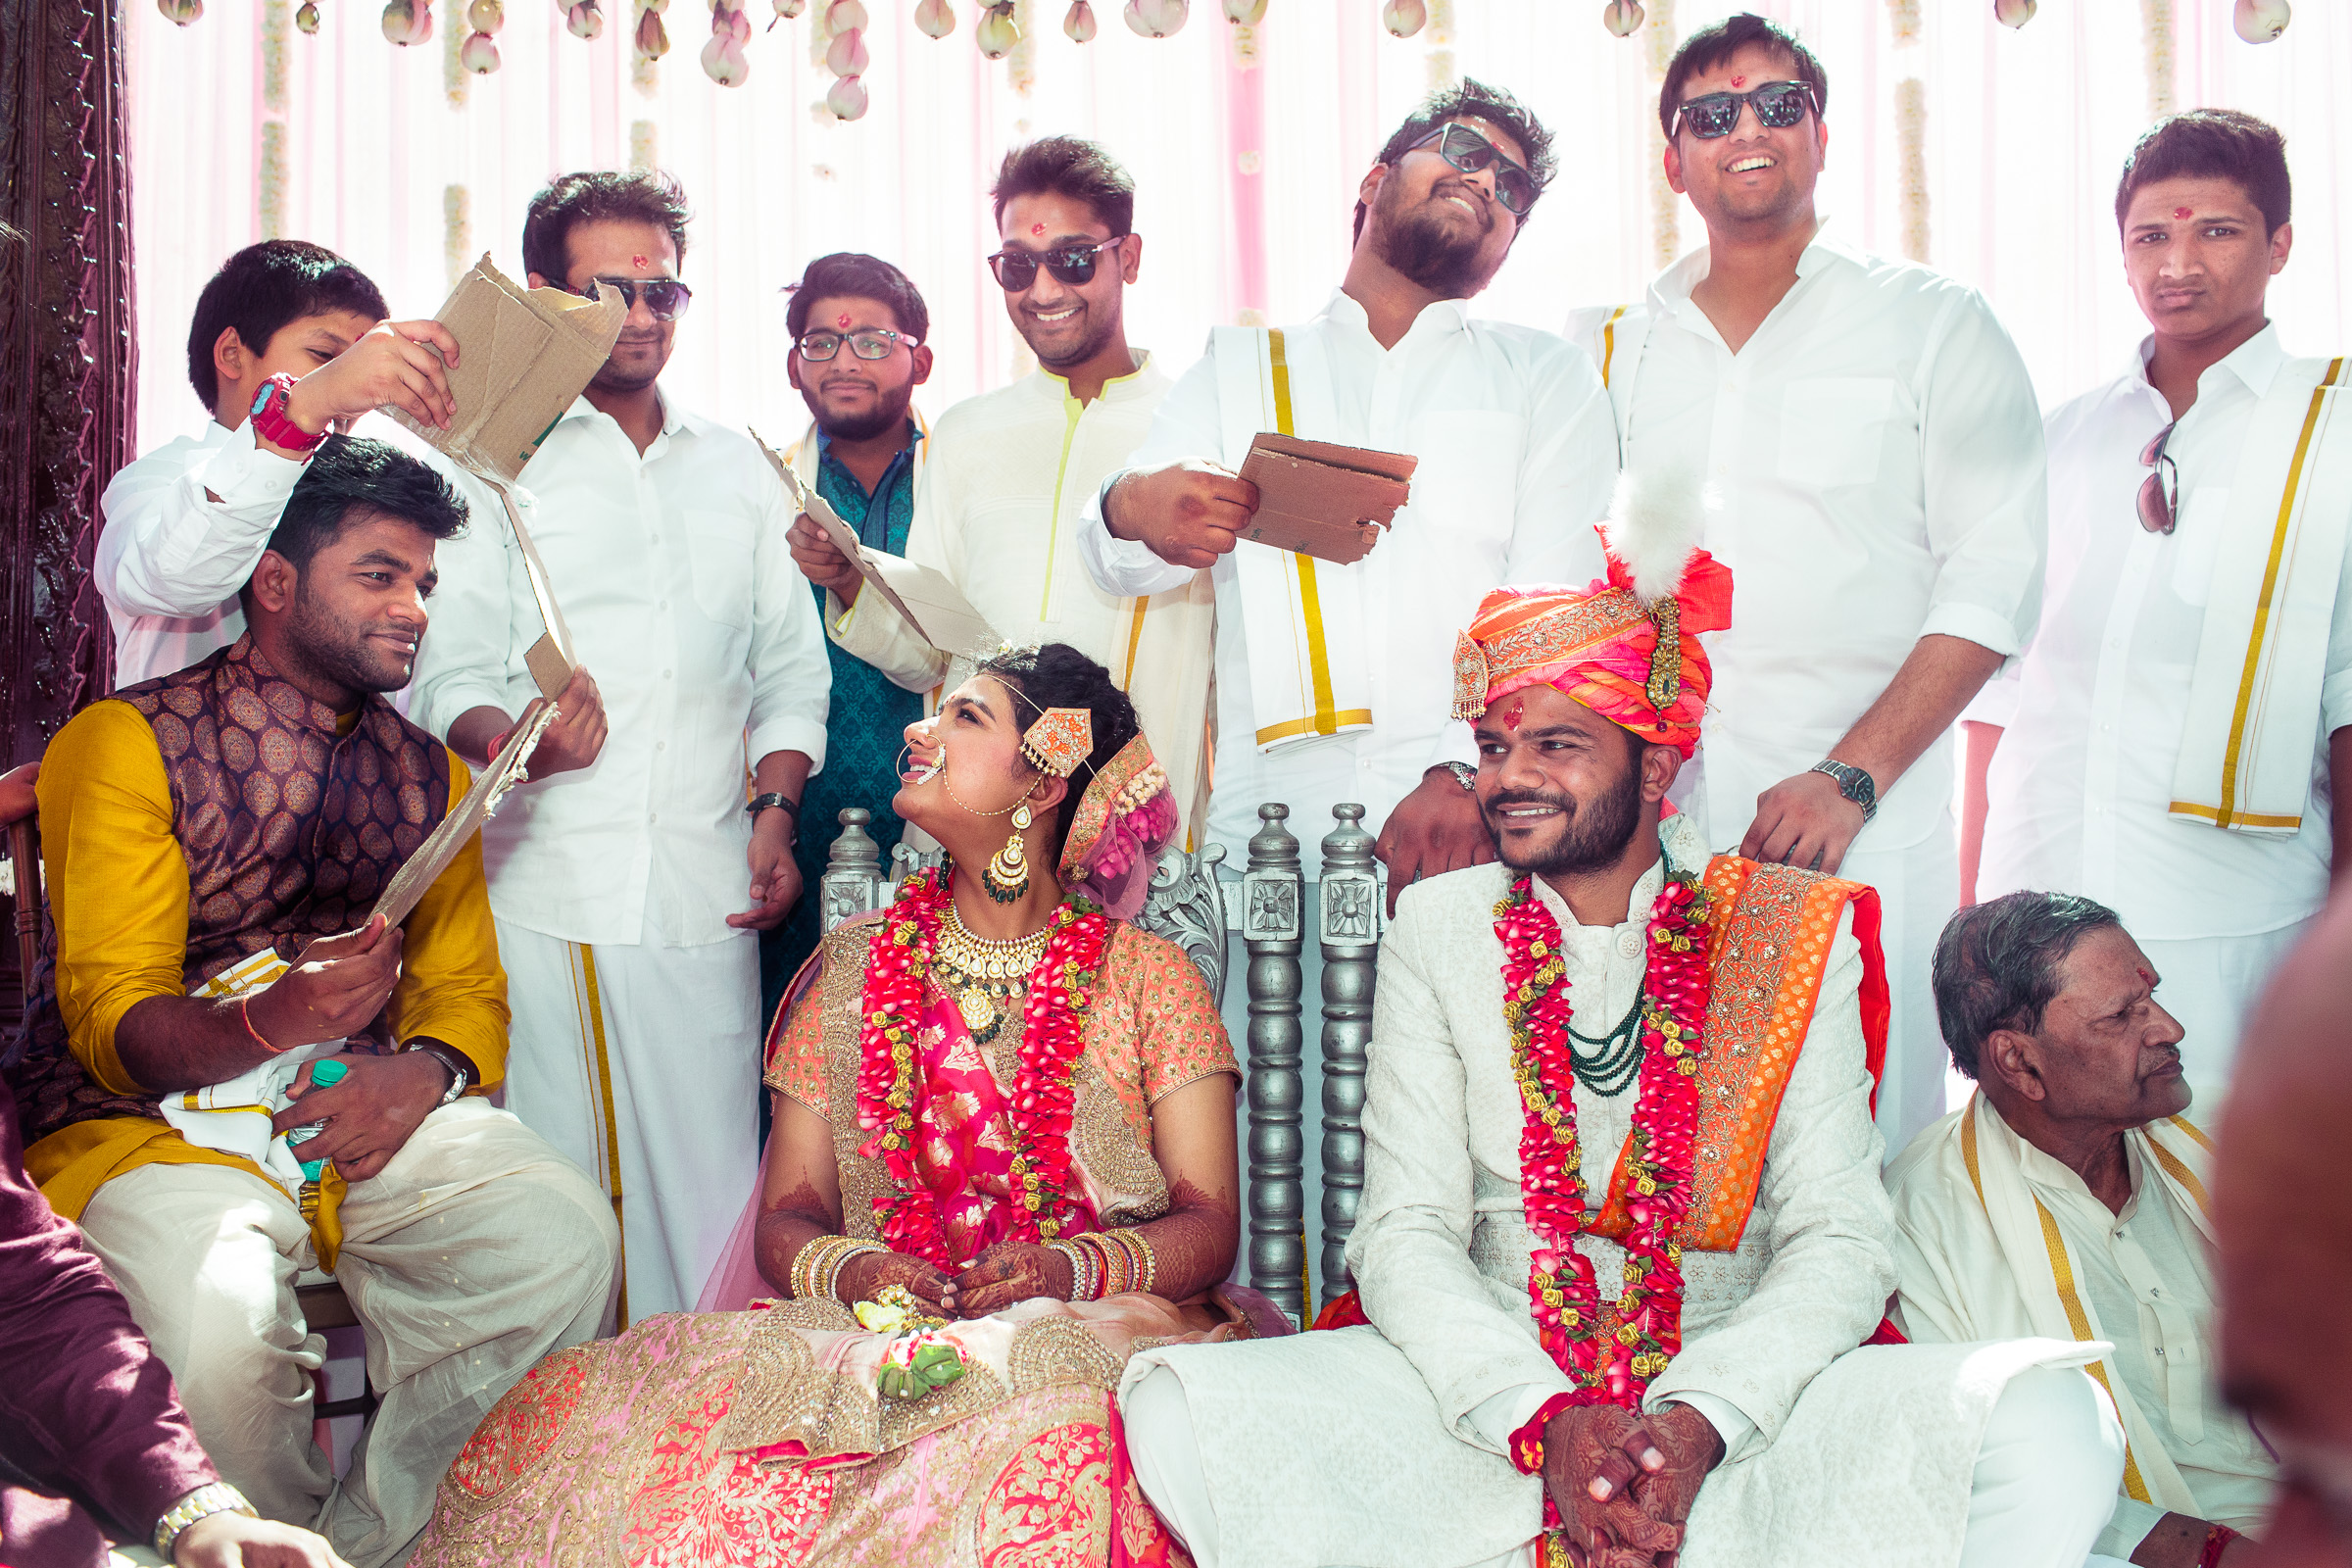 marwari-candid-wedding-photographers-bangalore-0036.jpg